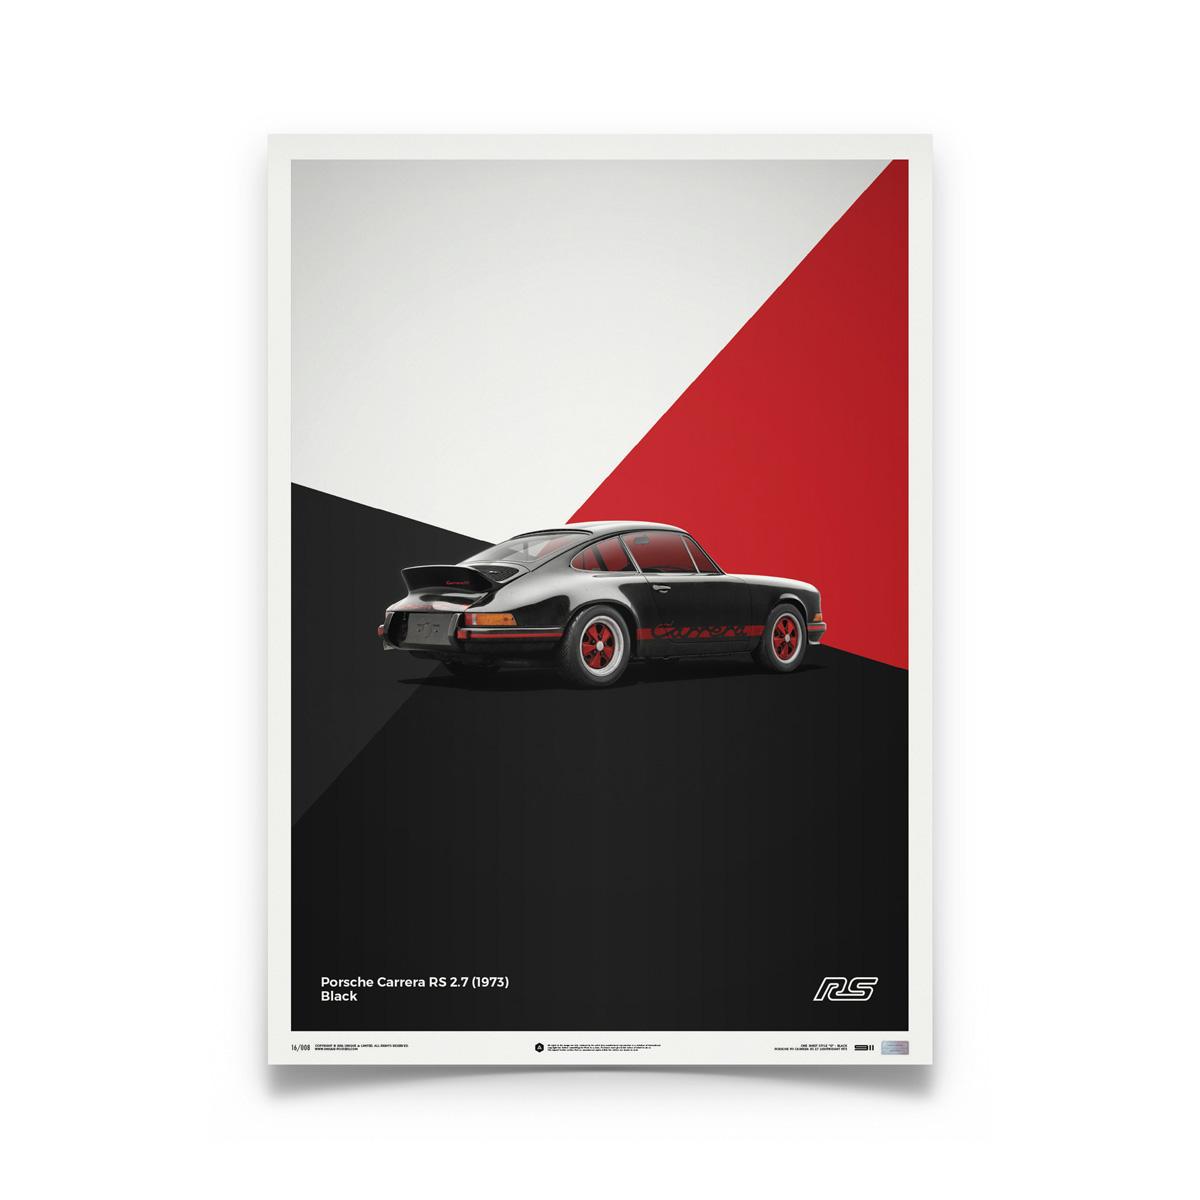 Product image for Porsche 911 RS – Black – 1973   Automobilist   Limited Edition poster